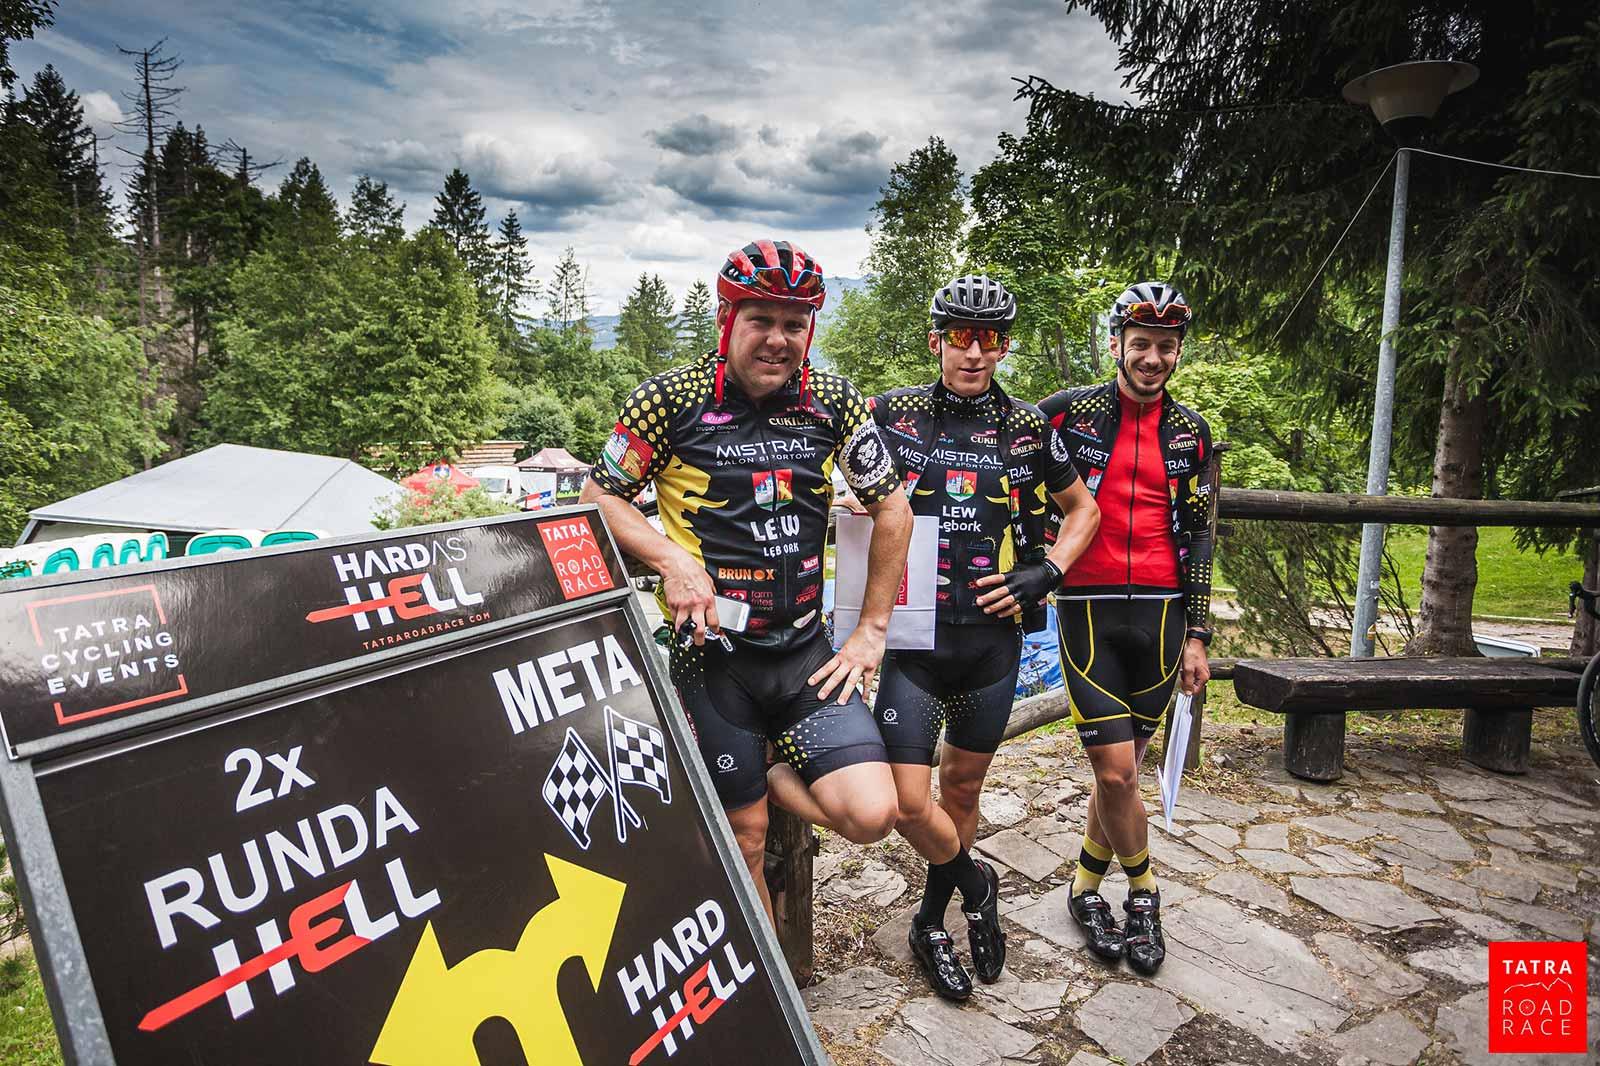 Tatra-Road-Race-6